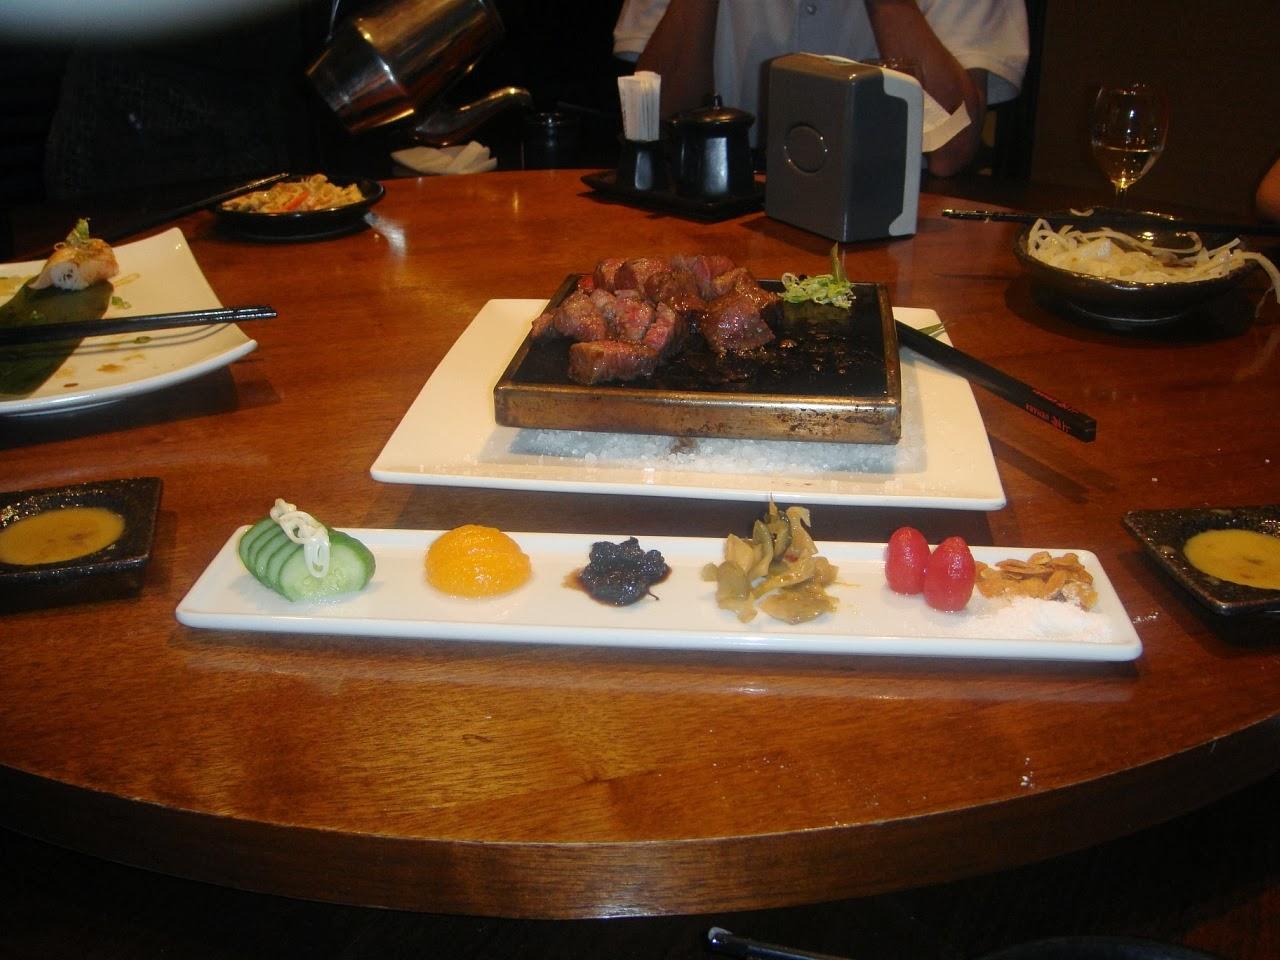 Японский ресторан, Азия, Asia, Japanese restaurant, fried beef